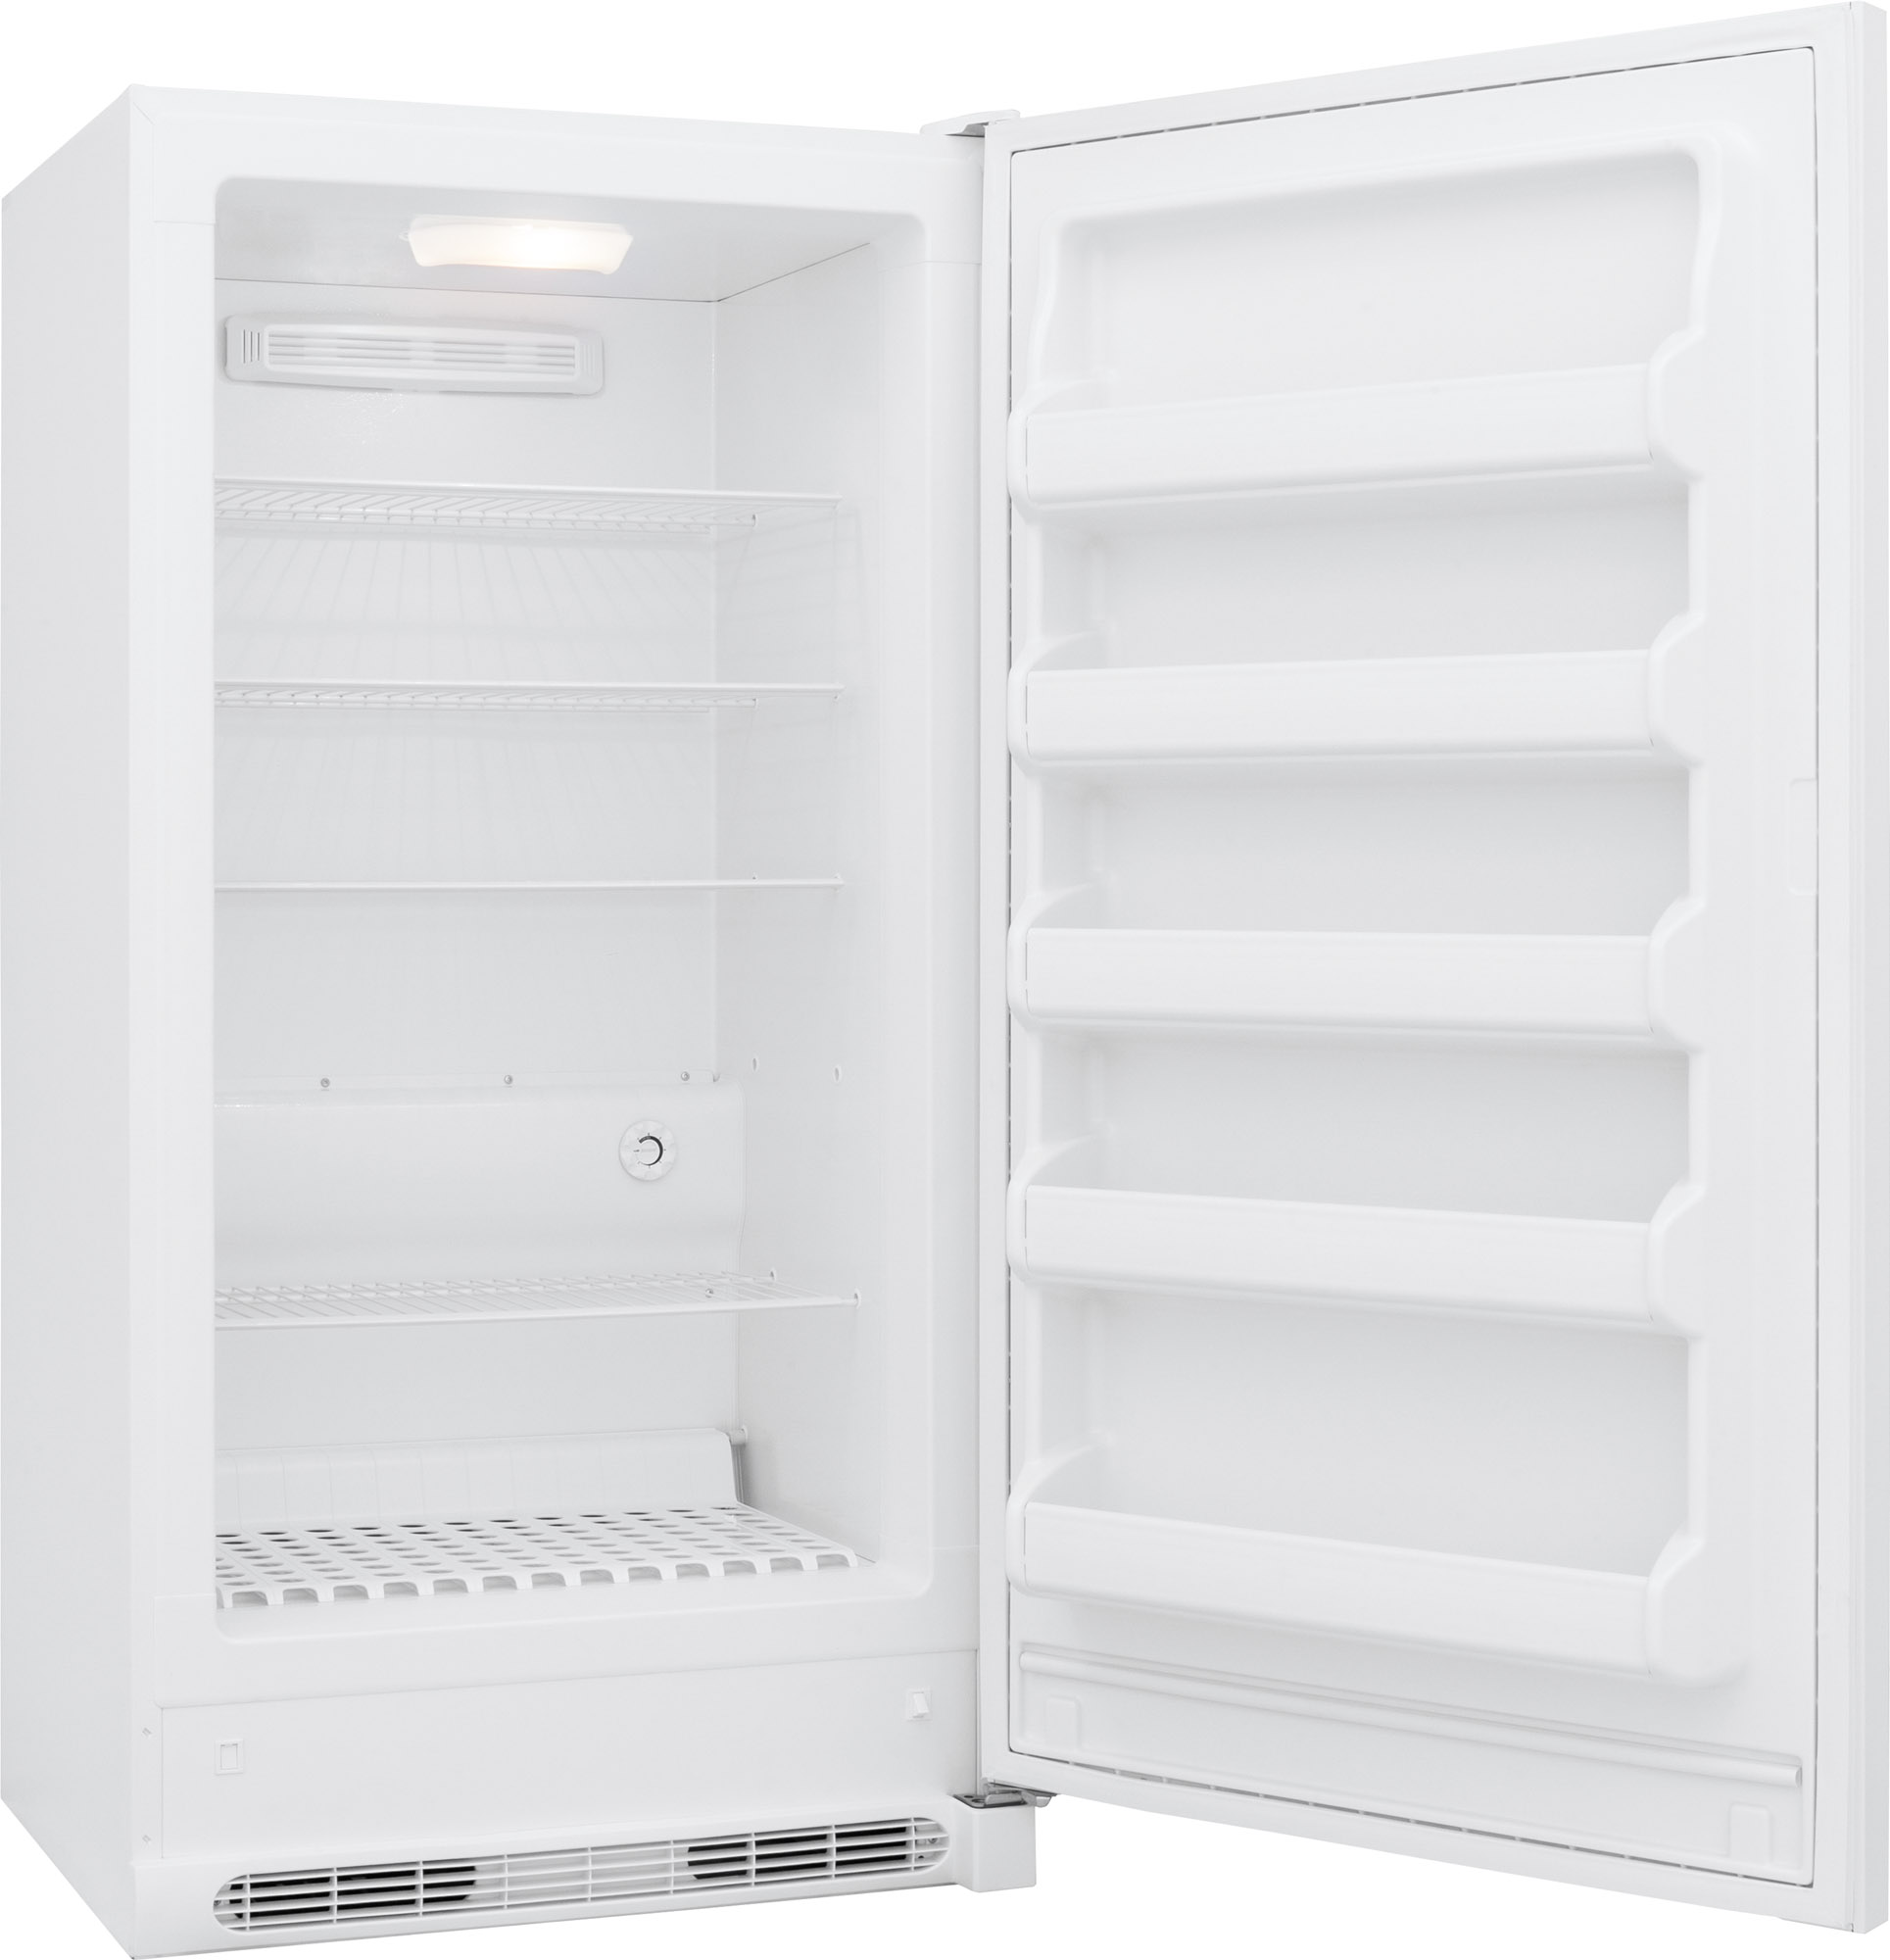 Frigidaire FFRU17B2QW 16.6 cu. ft. Counter-Depth Freezerless Refrigerator - White